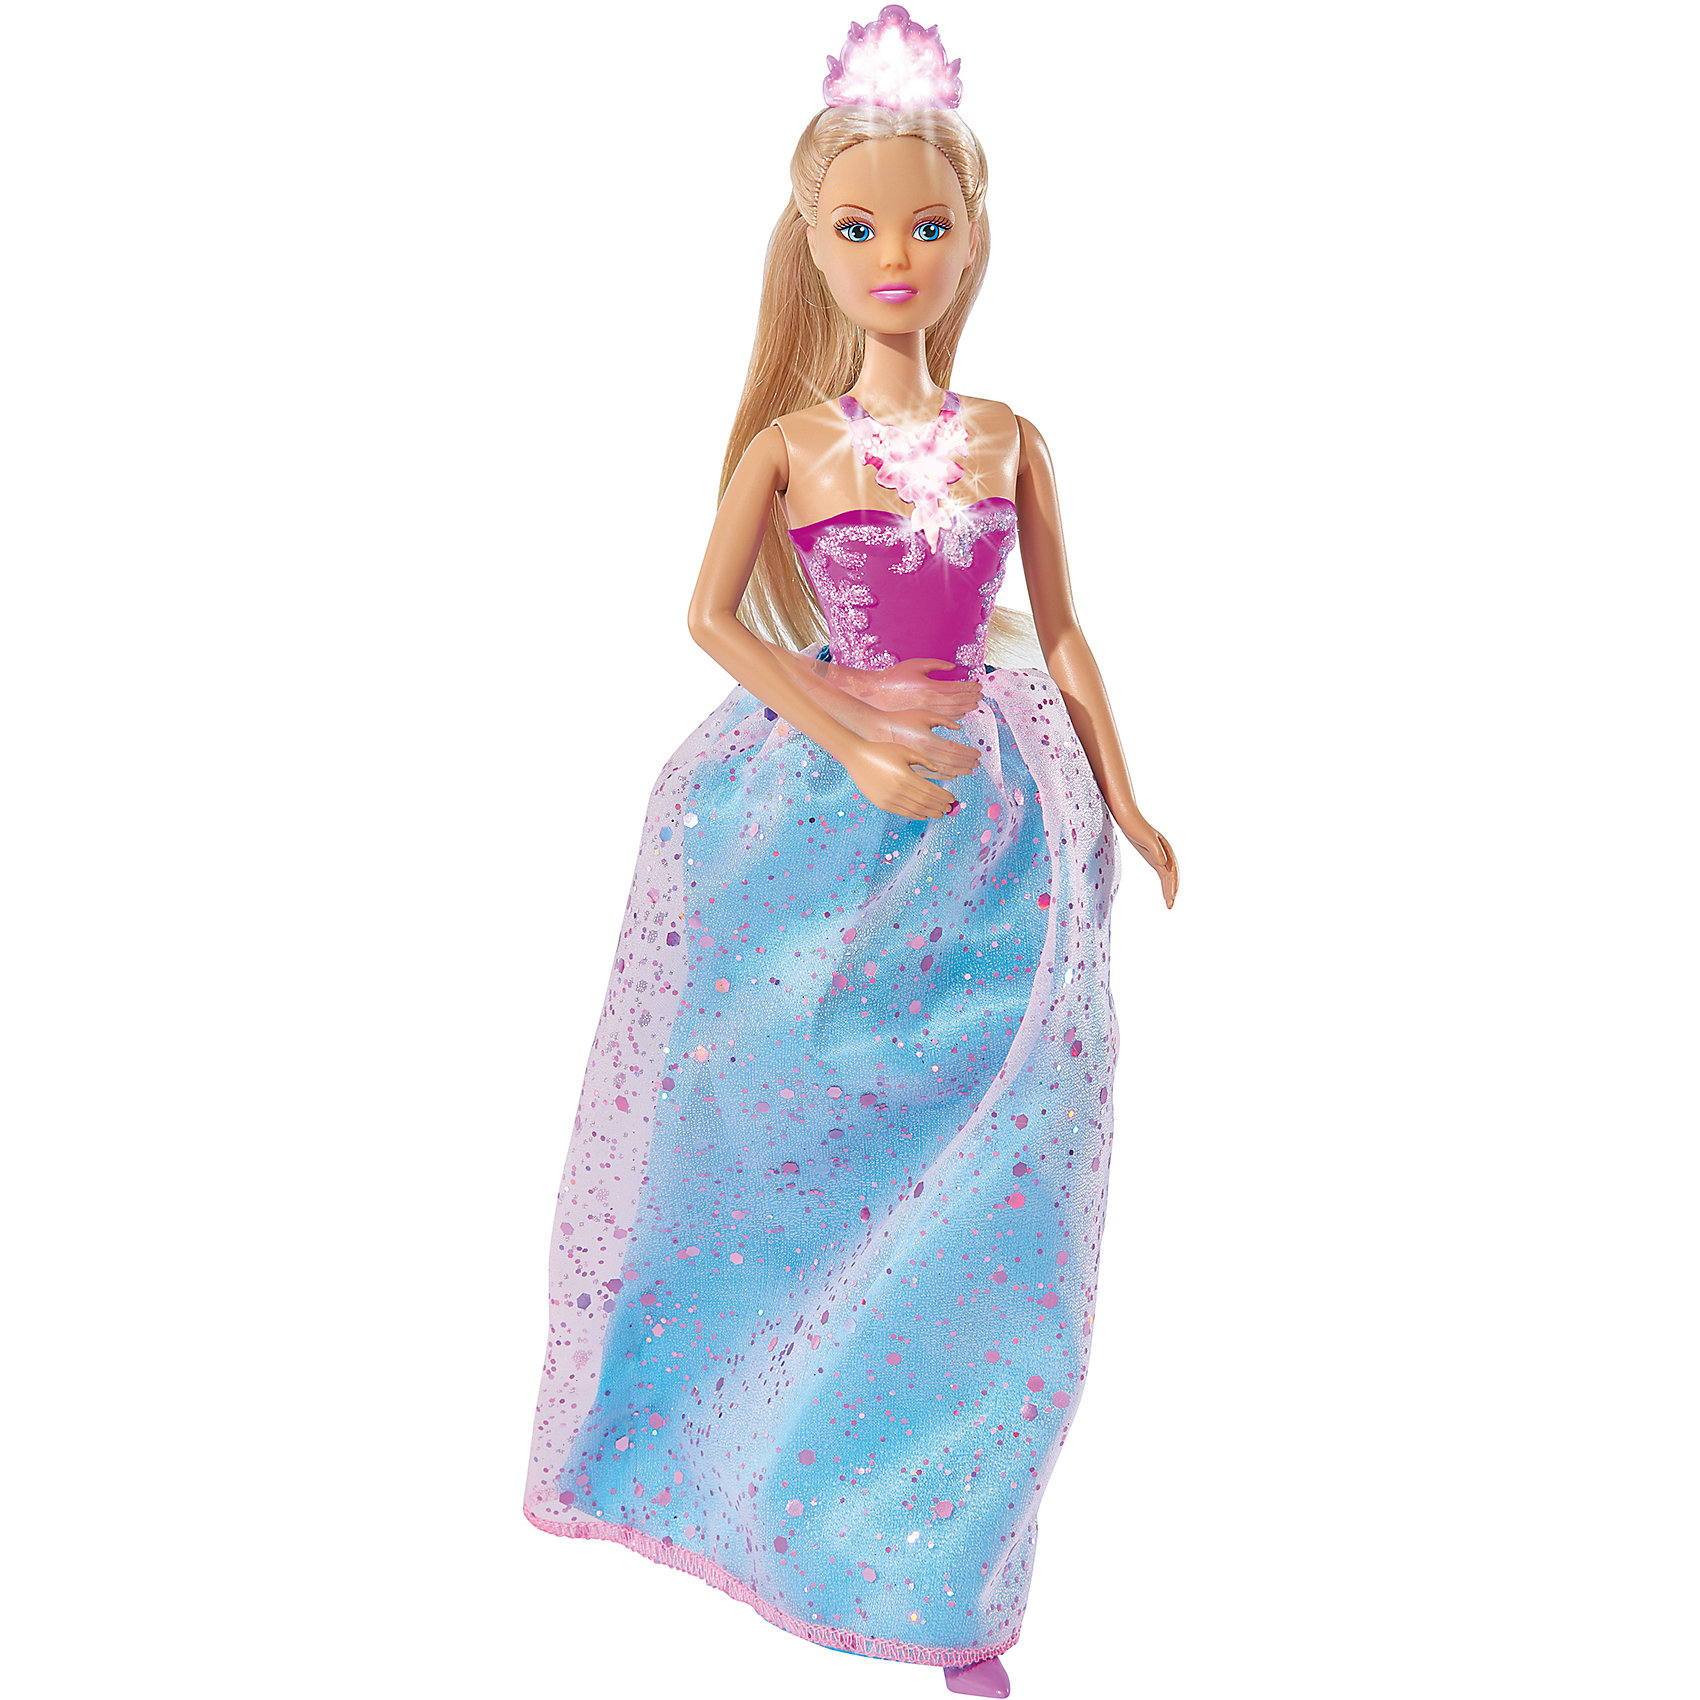 Simba Кукла Штеффи магическая принцесса, 29 см, Simba куклы и одежда для кукол precious кукла близко к сердцу 30 см